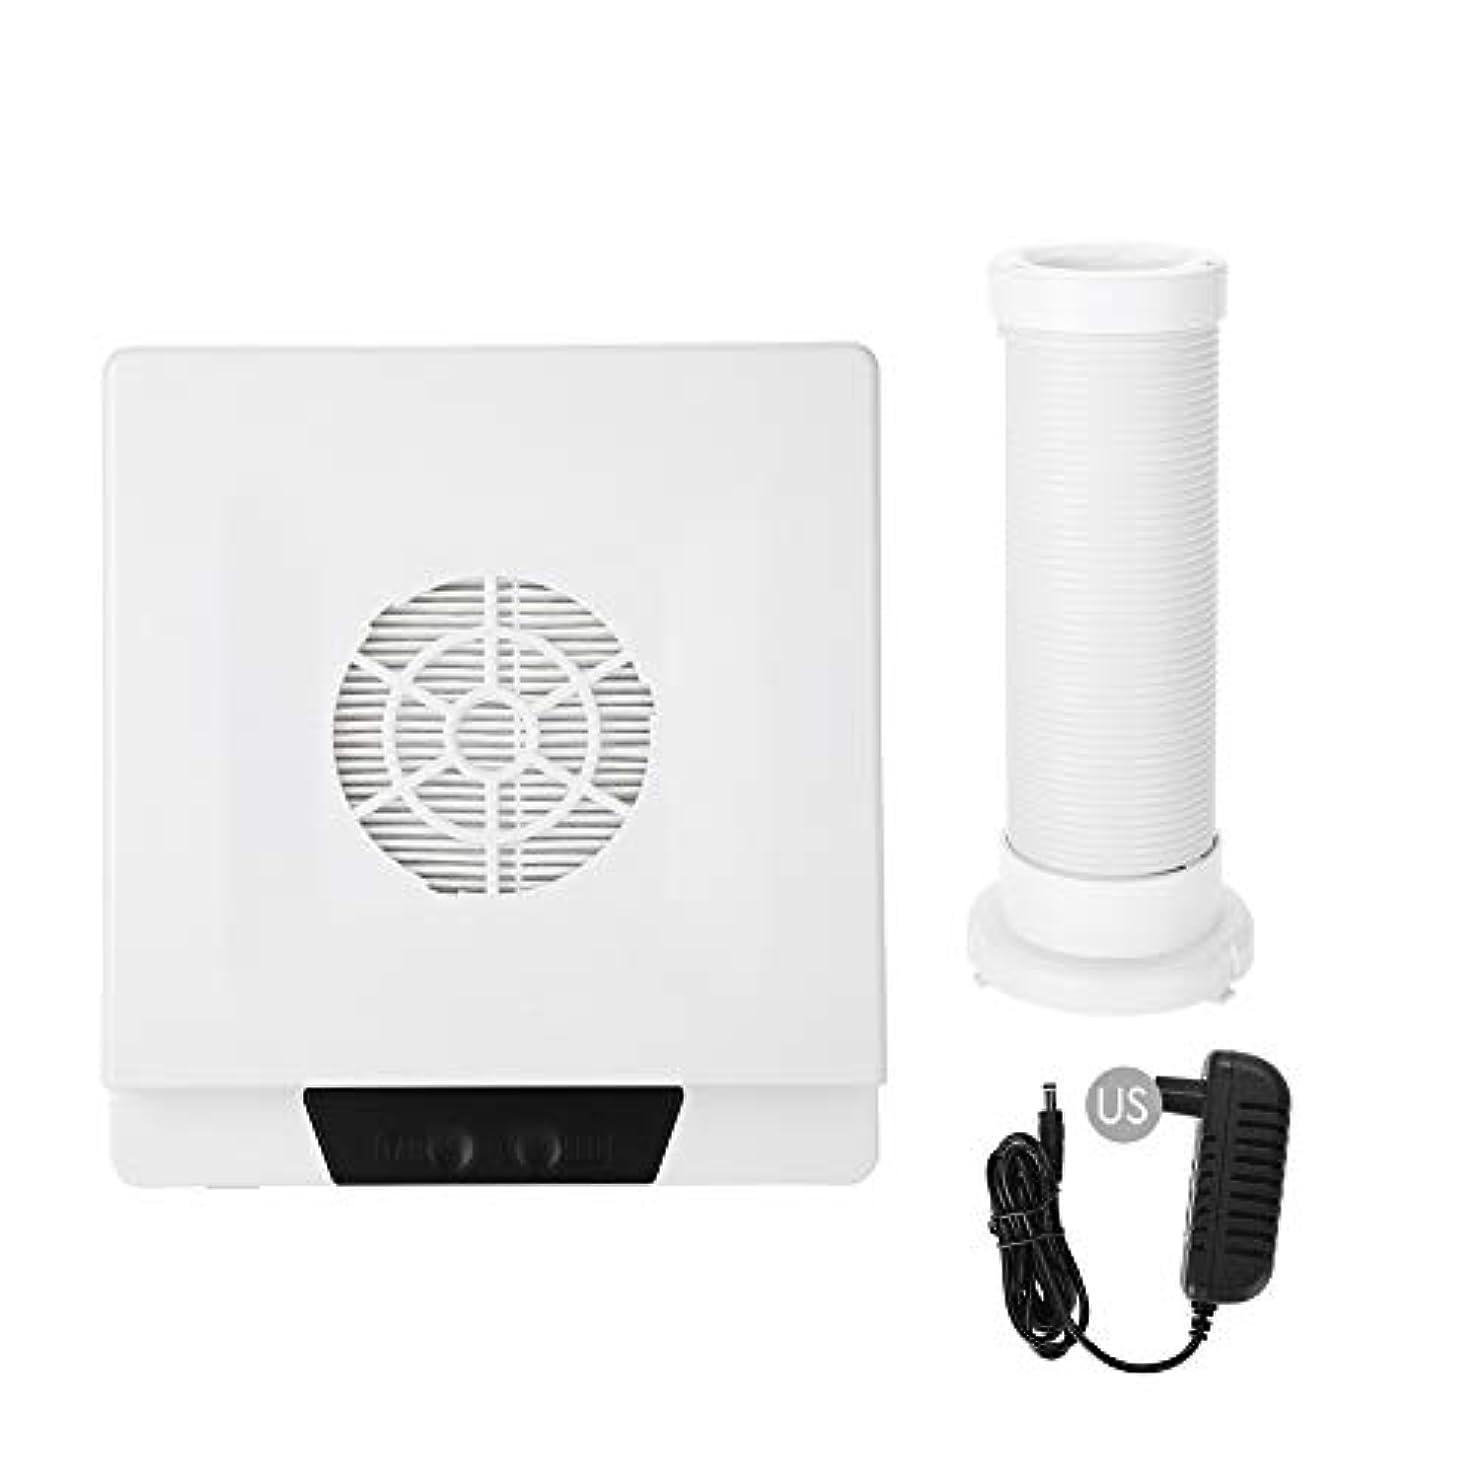 TOPINCN 60W 強い力 ネイルアートダストサクション ネイルアート集塵機 マニキュア掃除機 ネイルダストクリーナー(02)